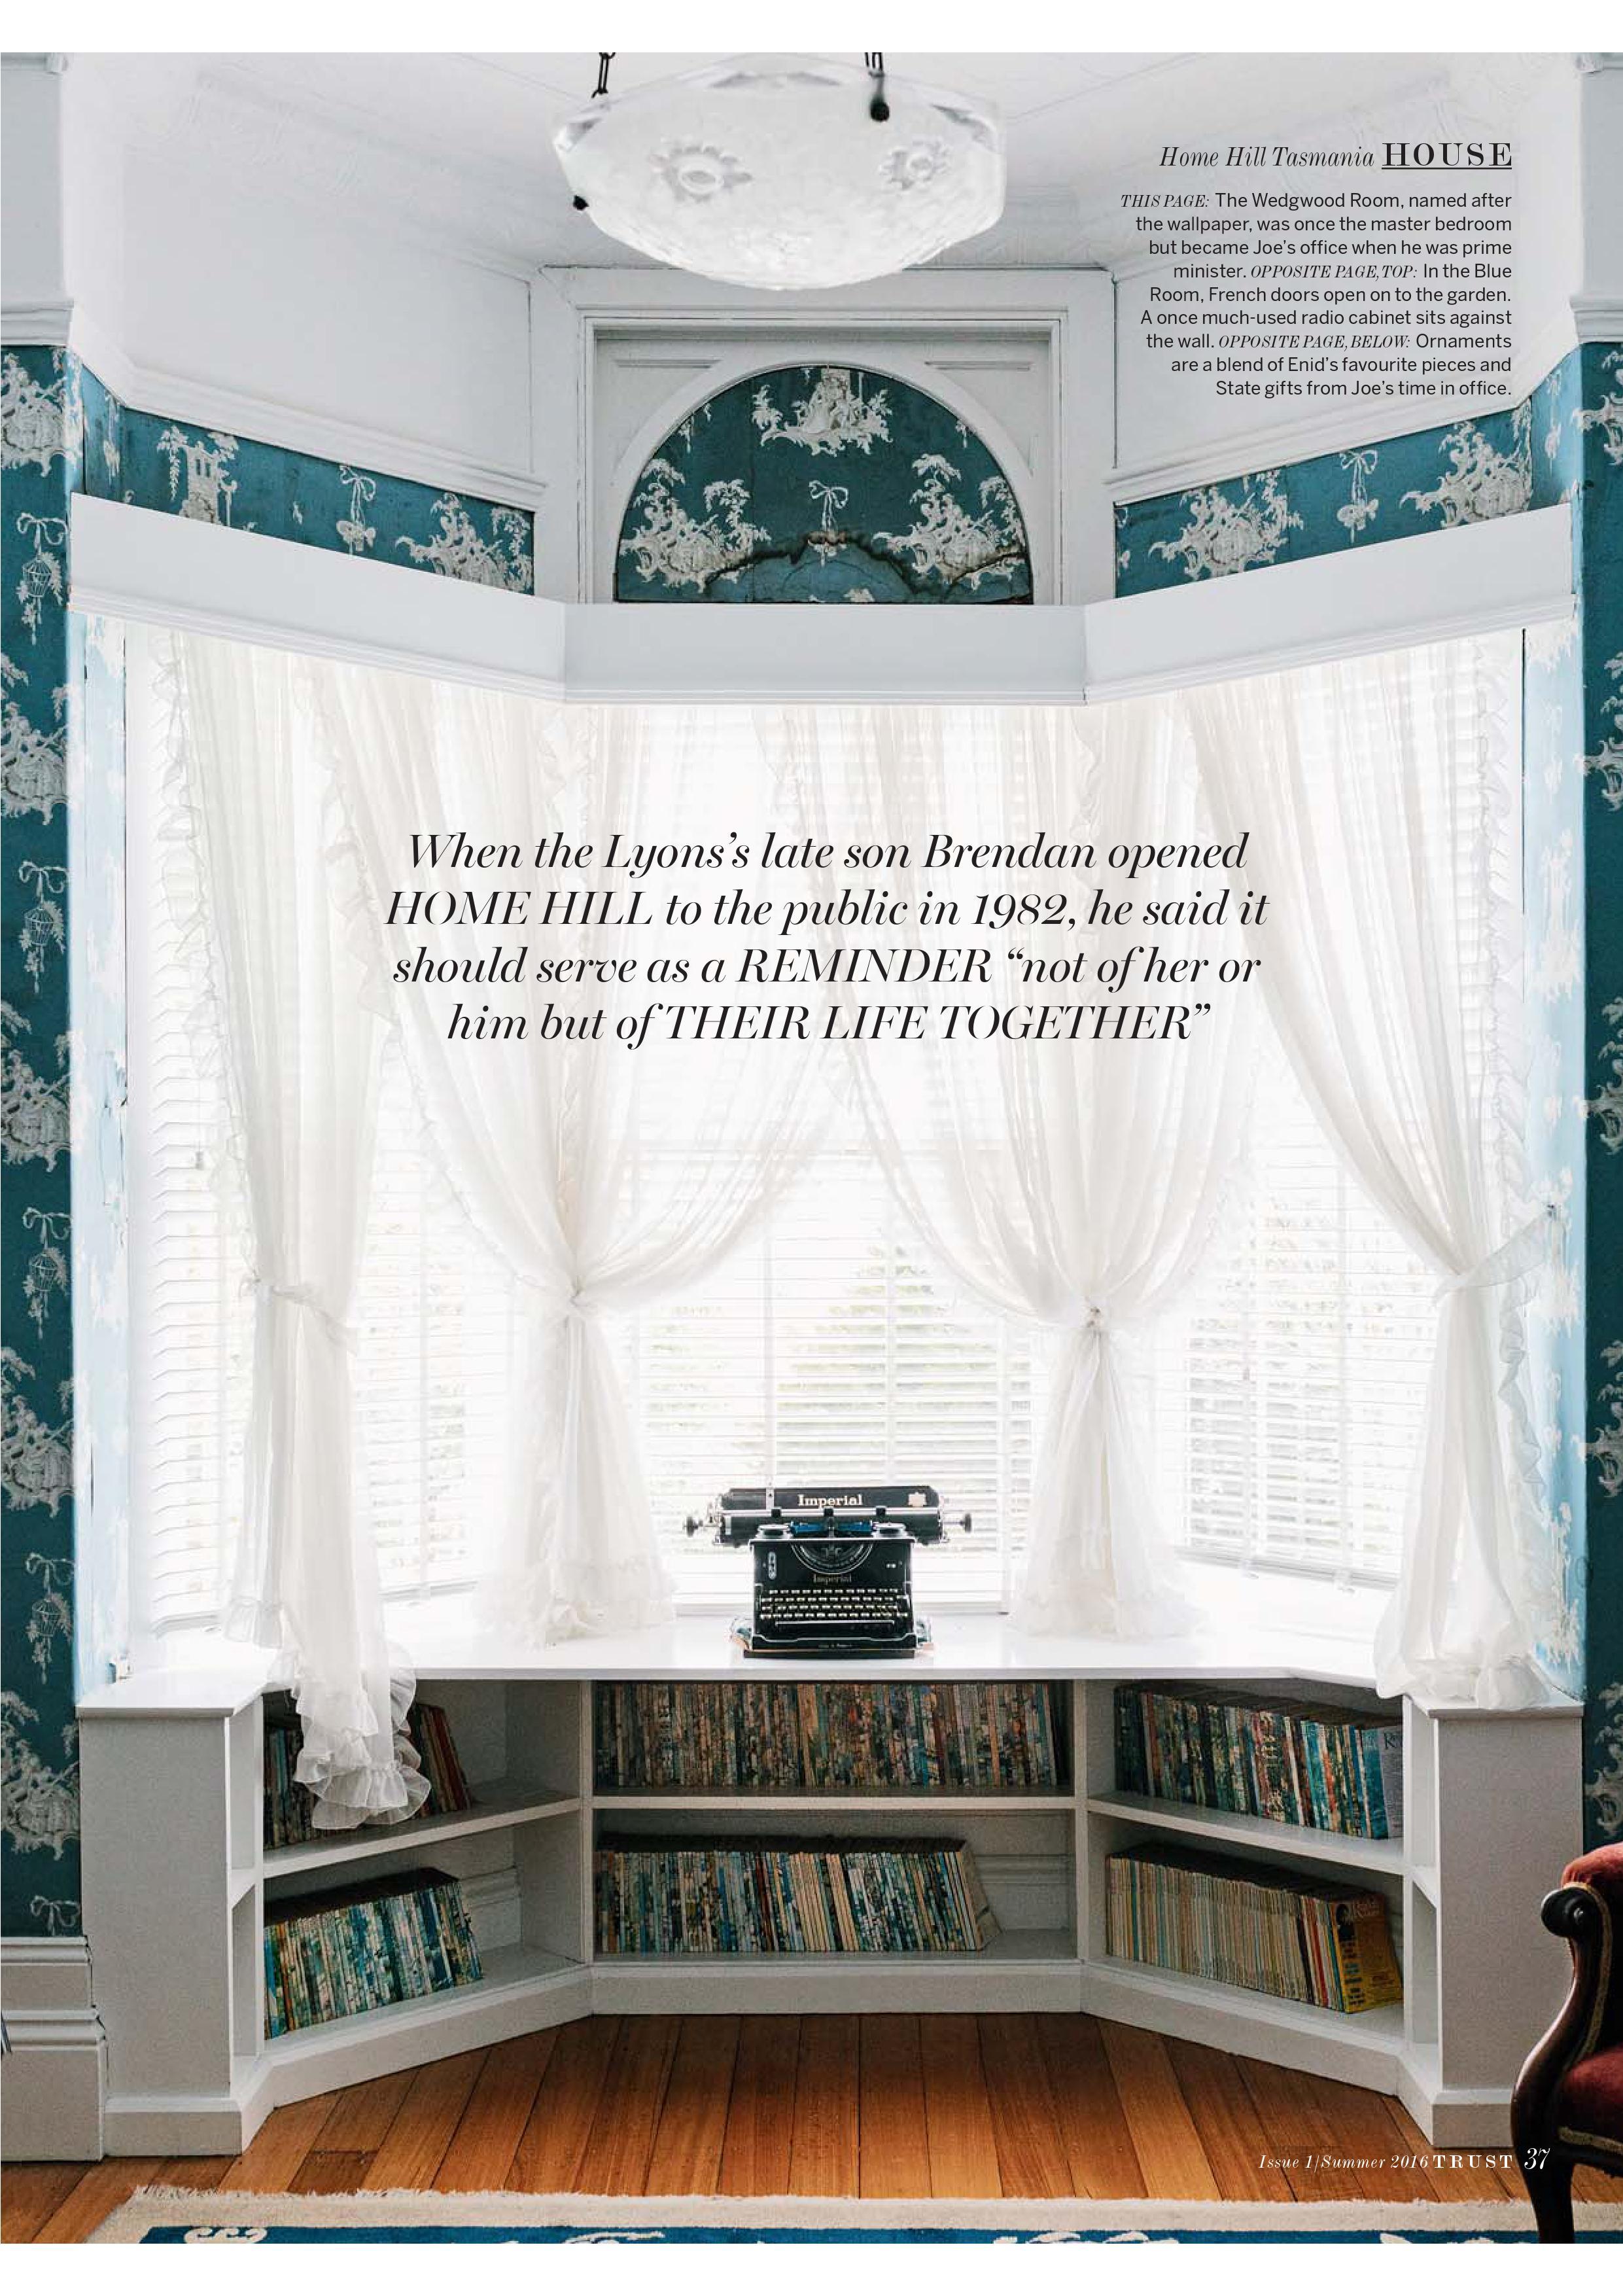 Marnie Hawson for The National Trusts of Australia magazine and Home Hill, Tasmania